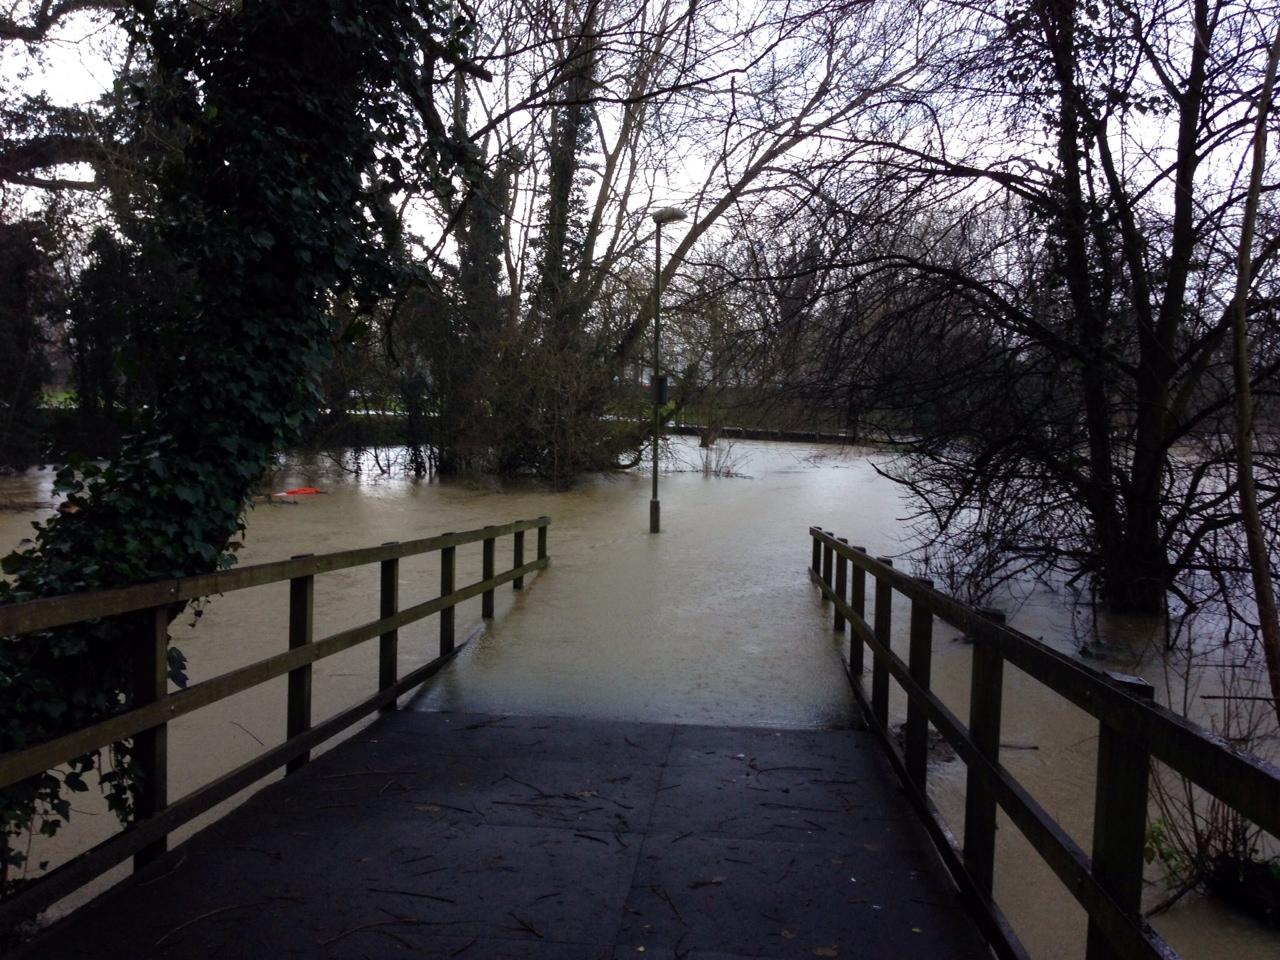 Flooded Ock walk